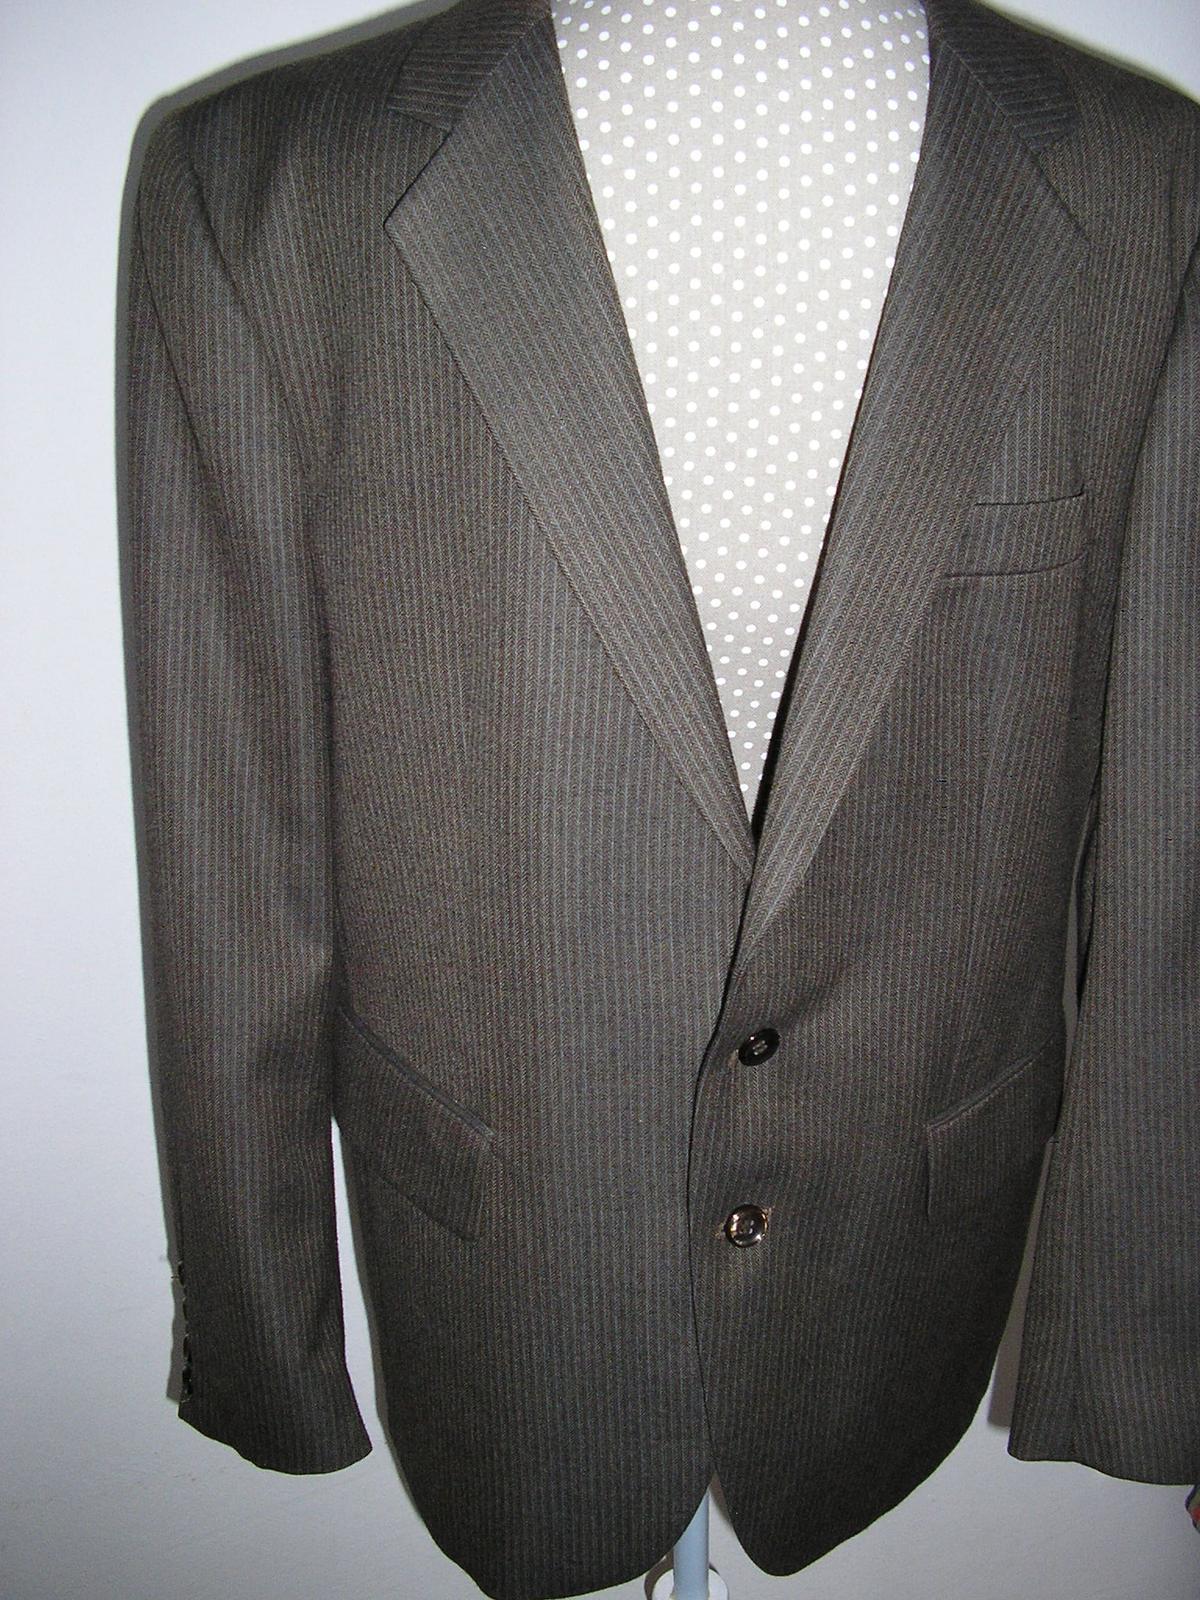 1210. Oblek pánsky - Obrázok č. 1